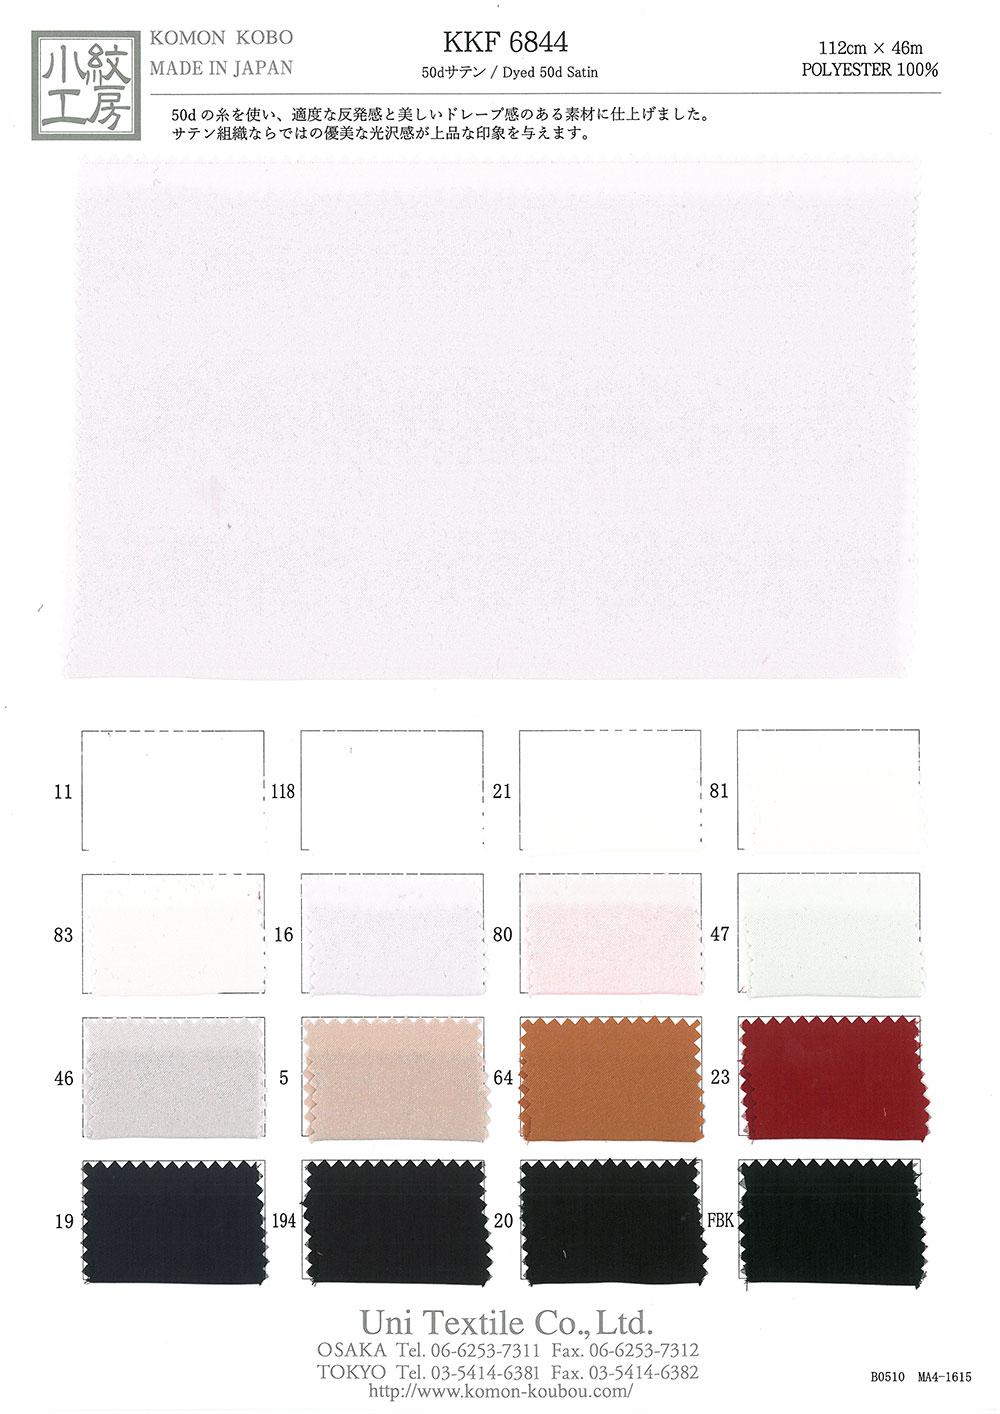 KKF6844 50d サテン[生地] 宇仁繊維/オークラ商事 - ApparelX アパレル資材卸通販